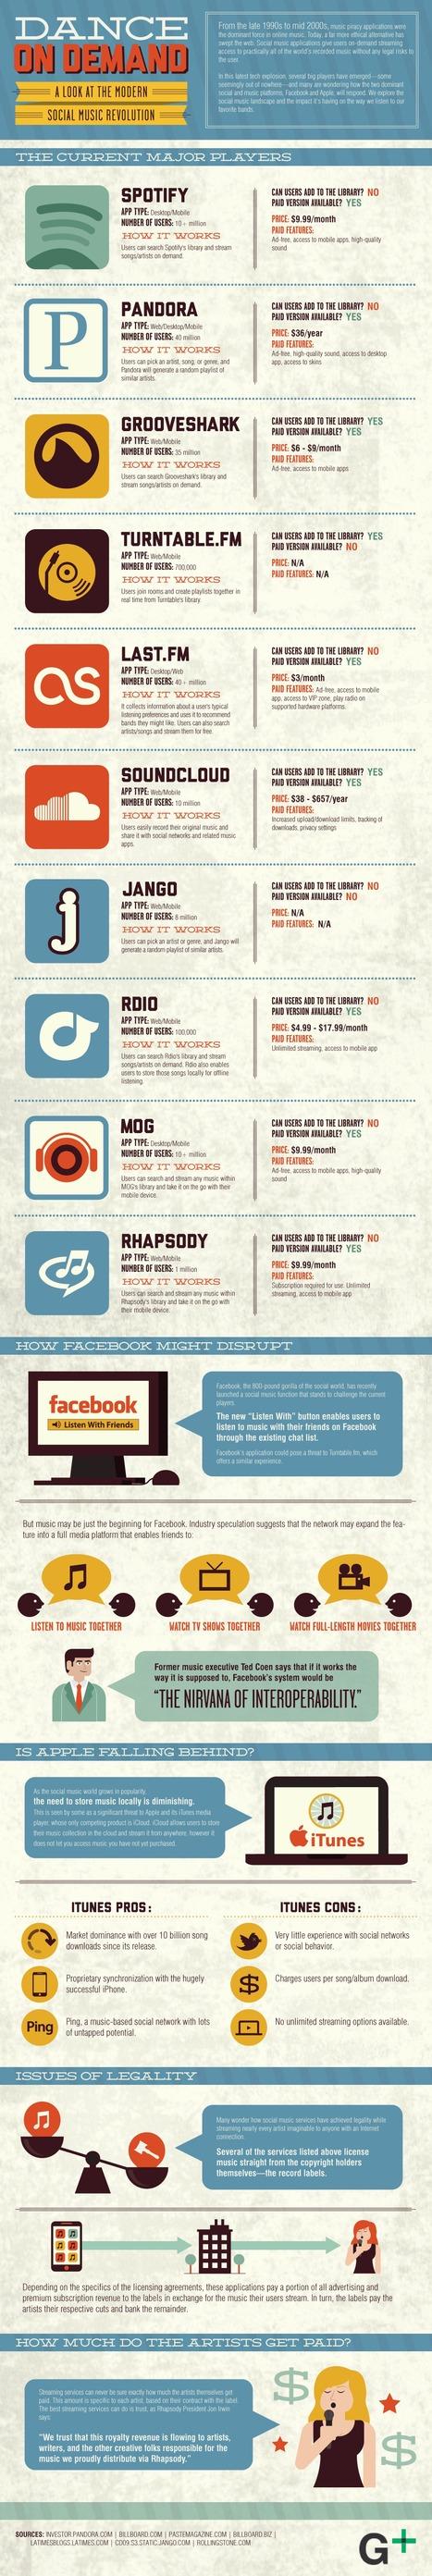 Infographic: The Online Music Landscape   Radio digitale   Scoop.it